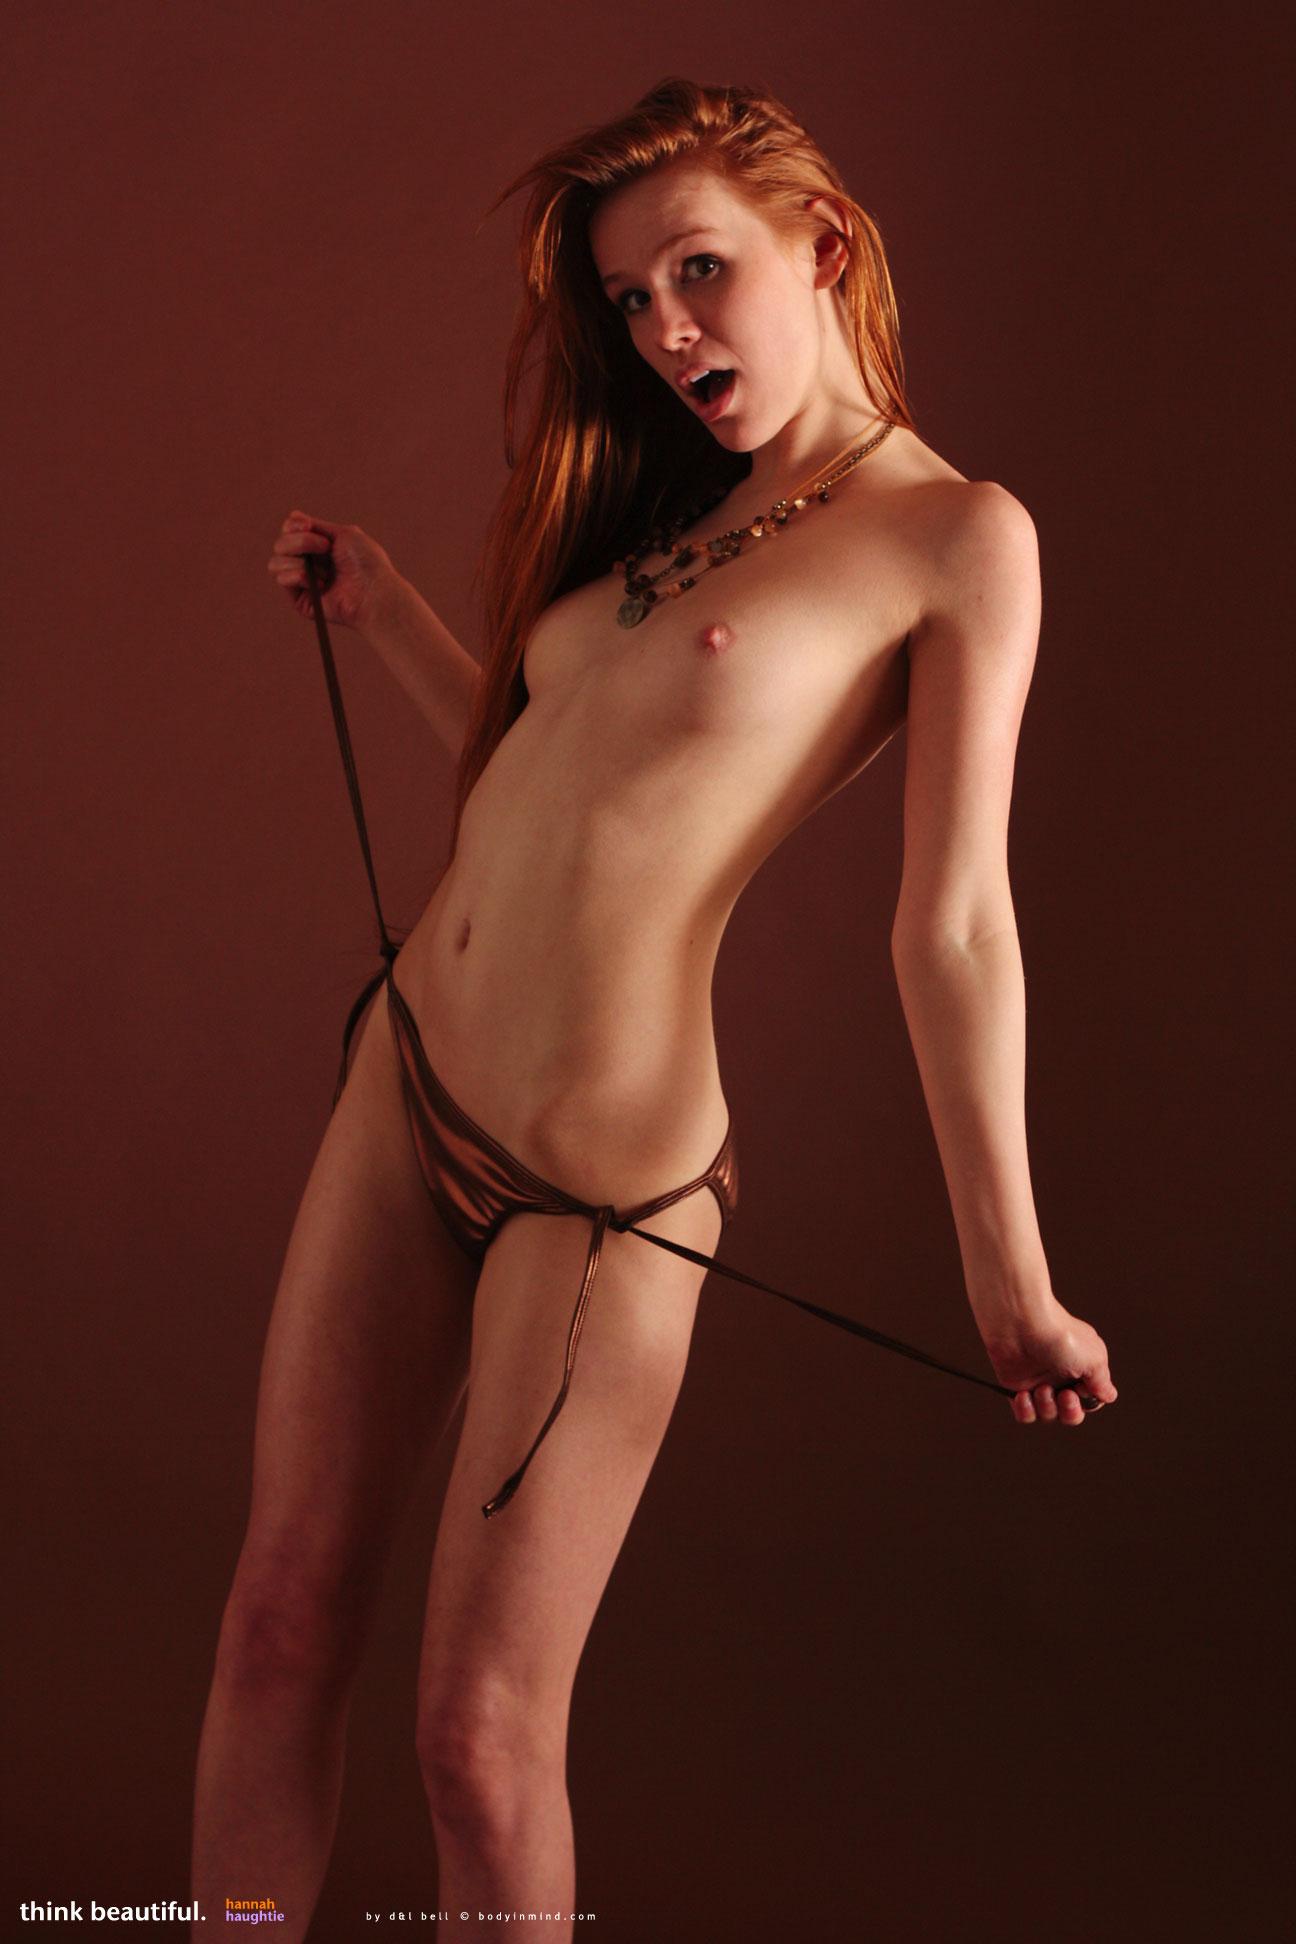 hannah-long-hair-redhead-naked-young-bodyinmind-04